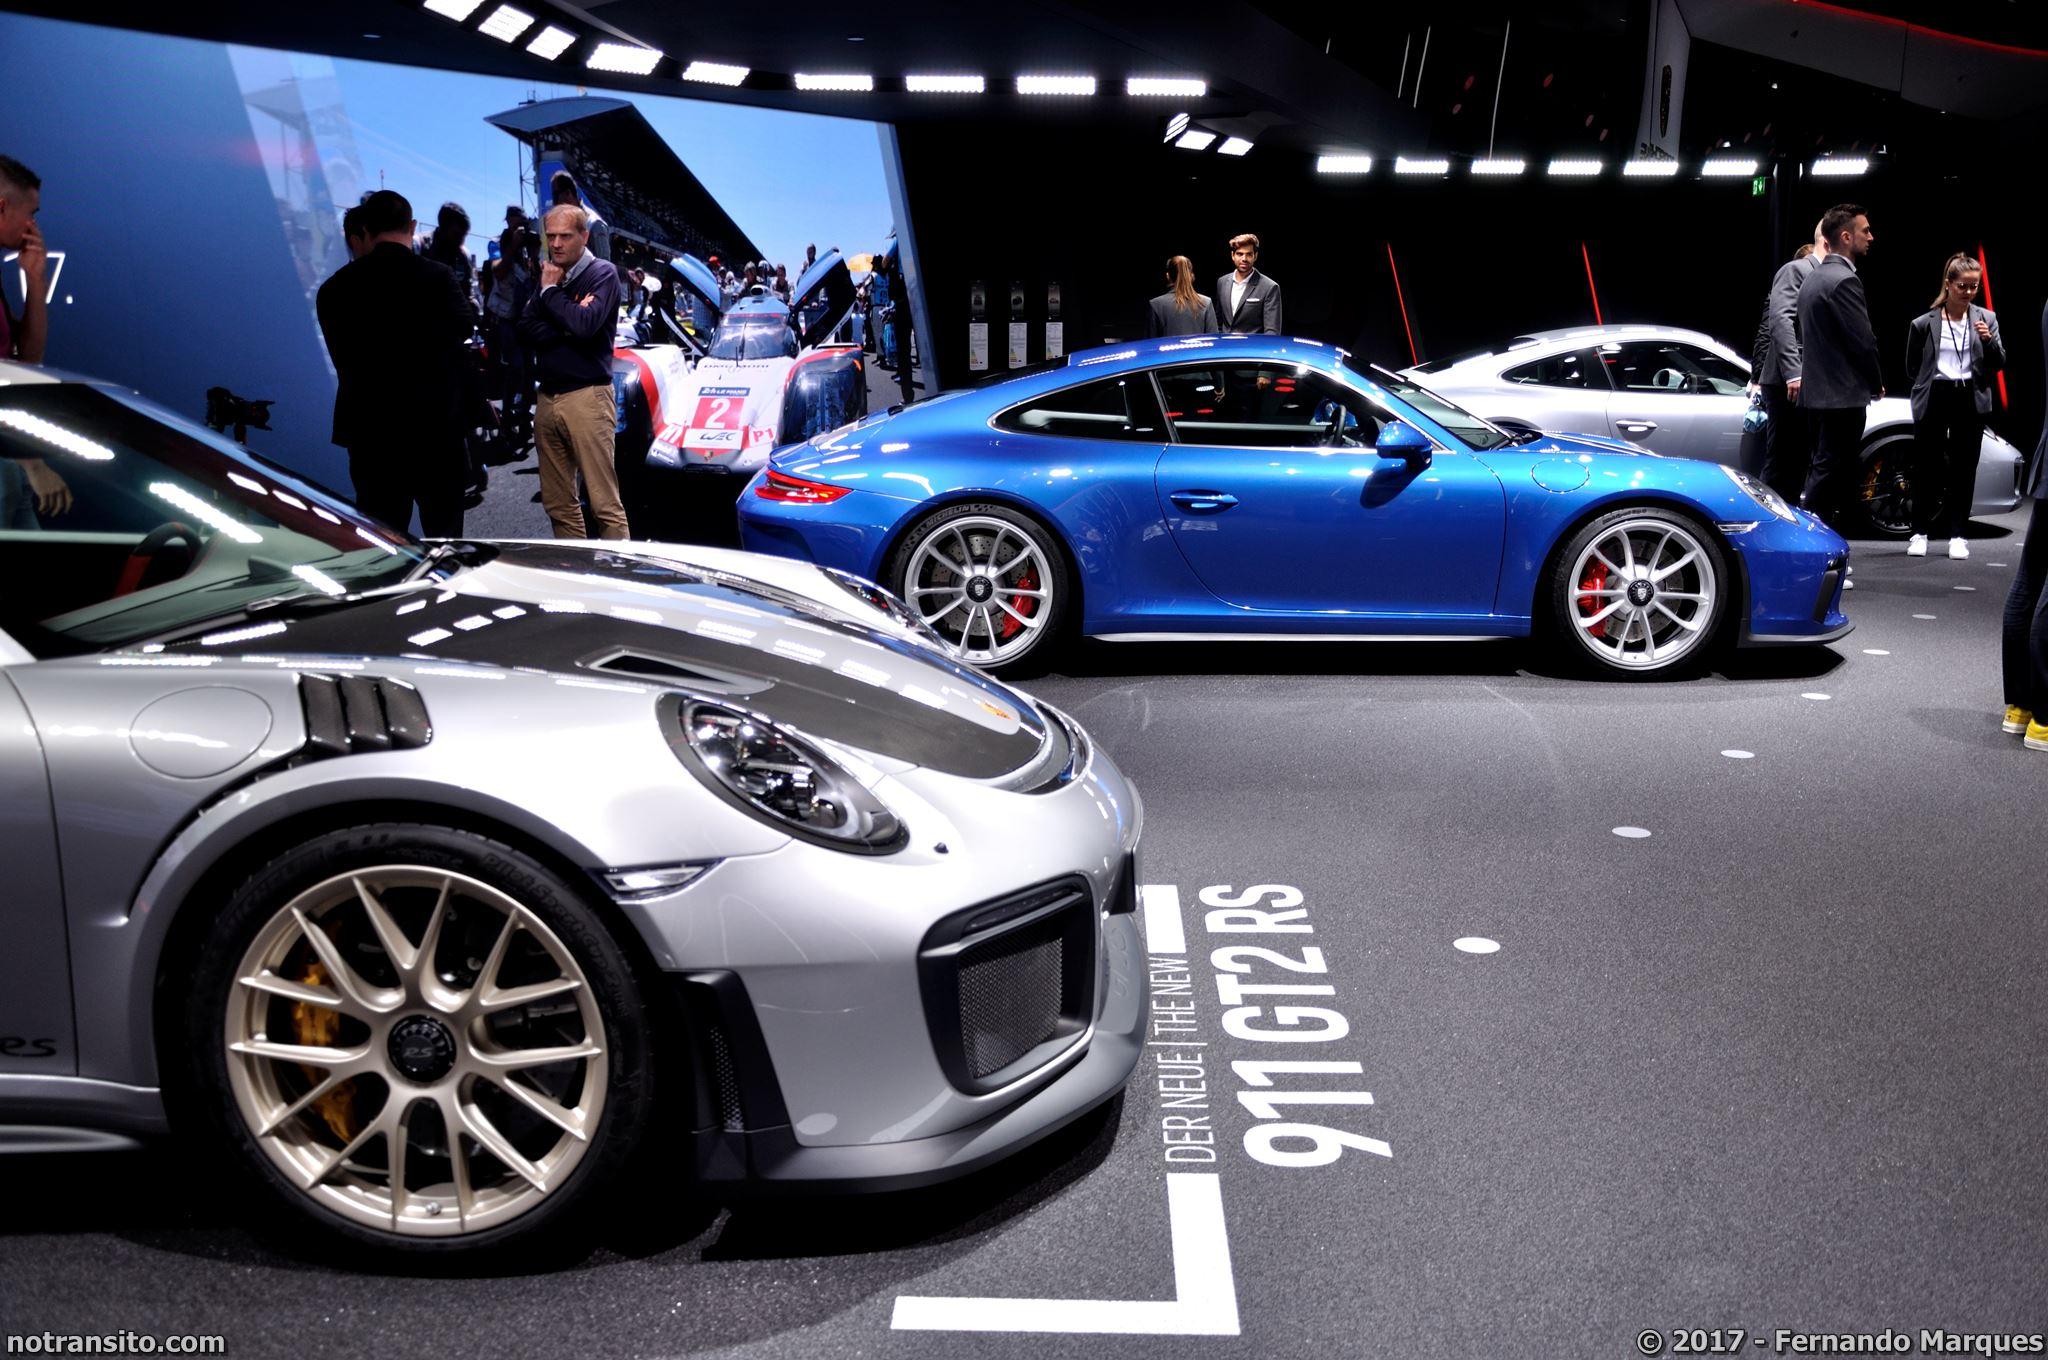 Porsche-911-GT3-Touring-Package-Frankfurt-2017-003